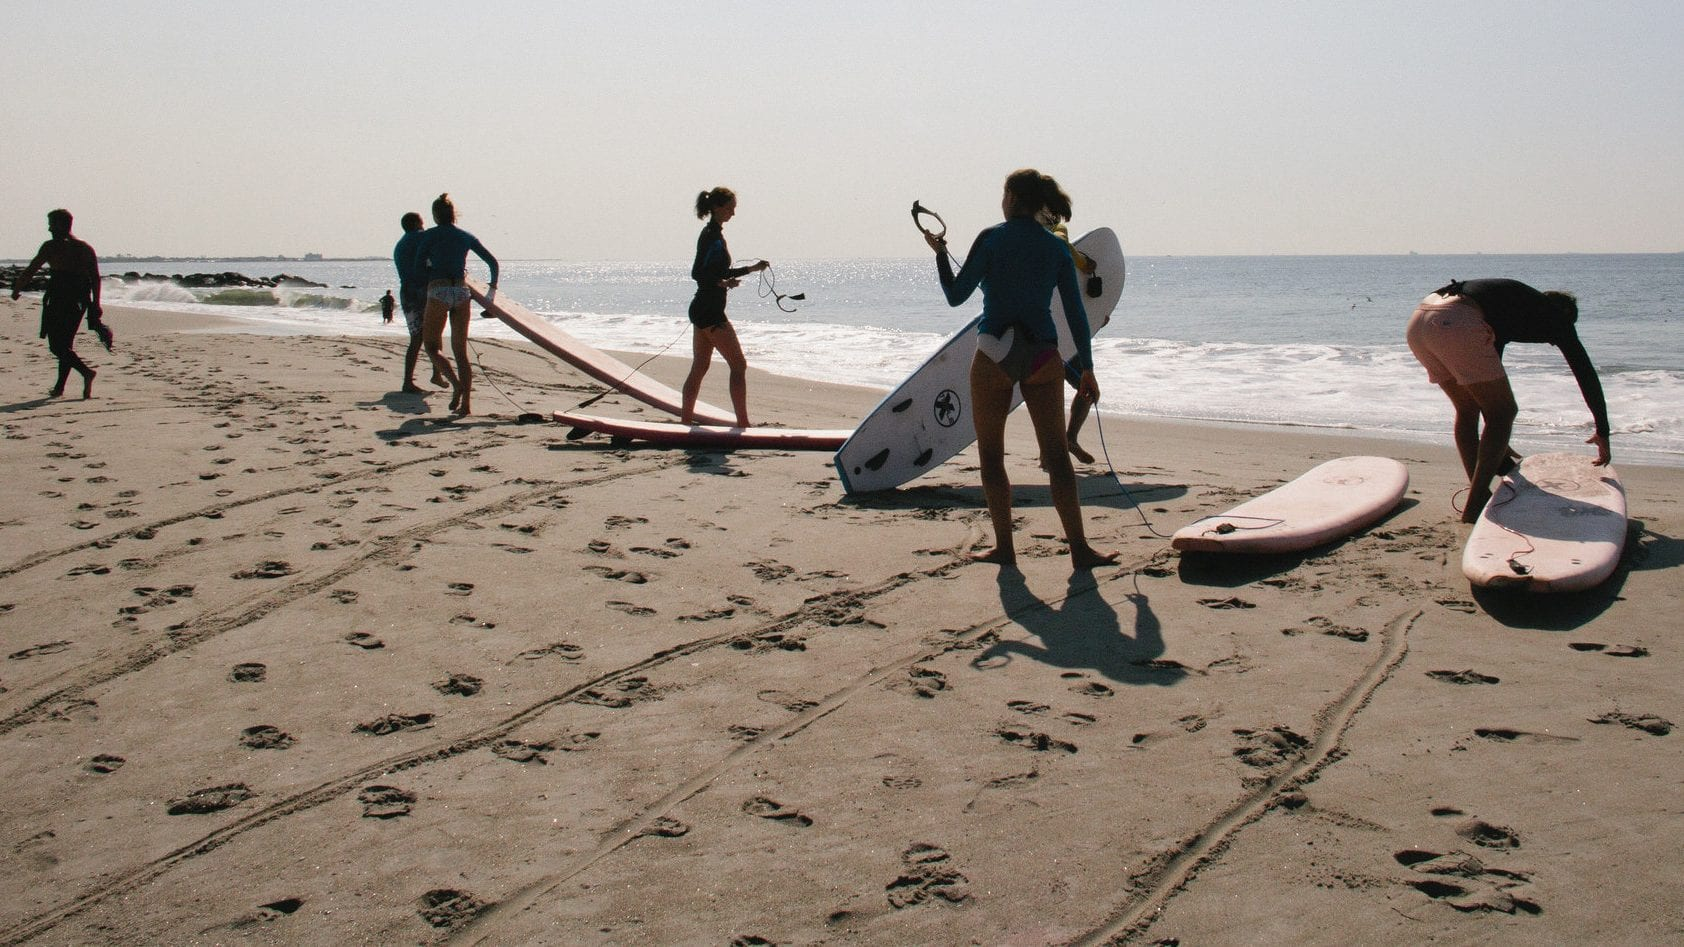 Surfing in the Rockaways